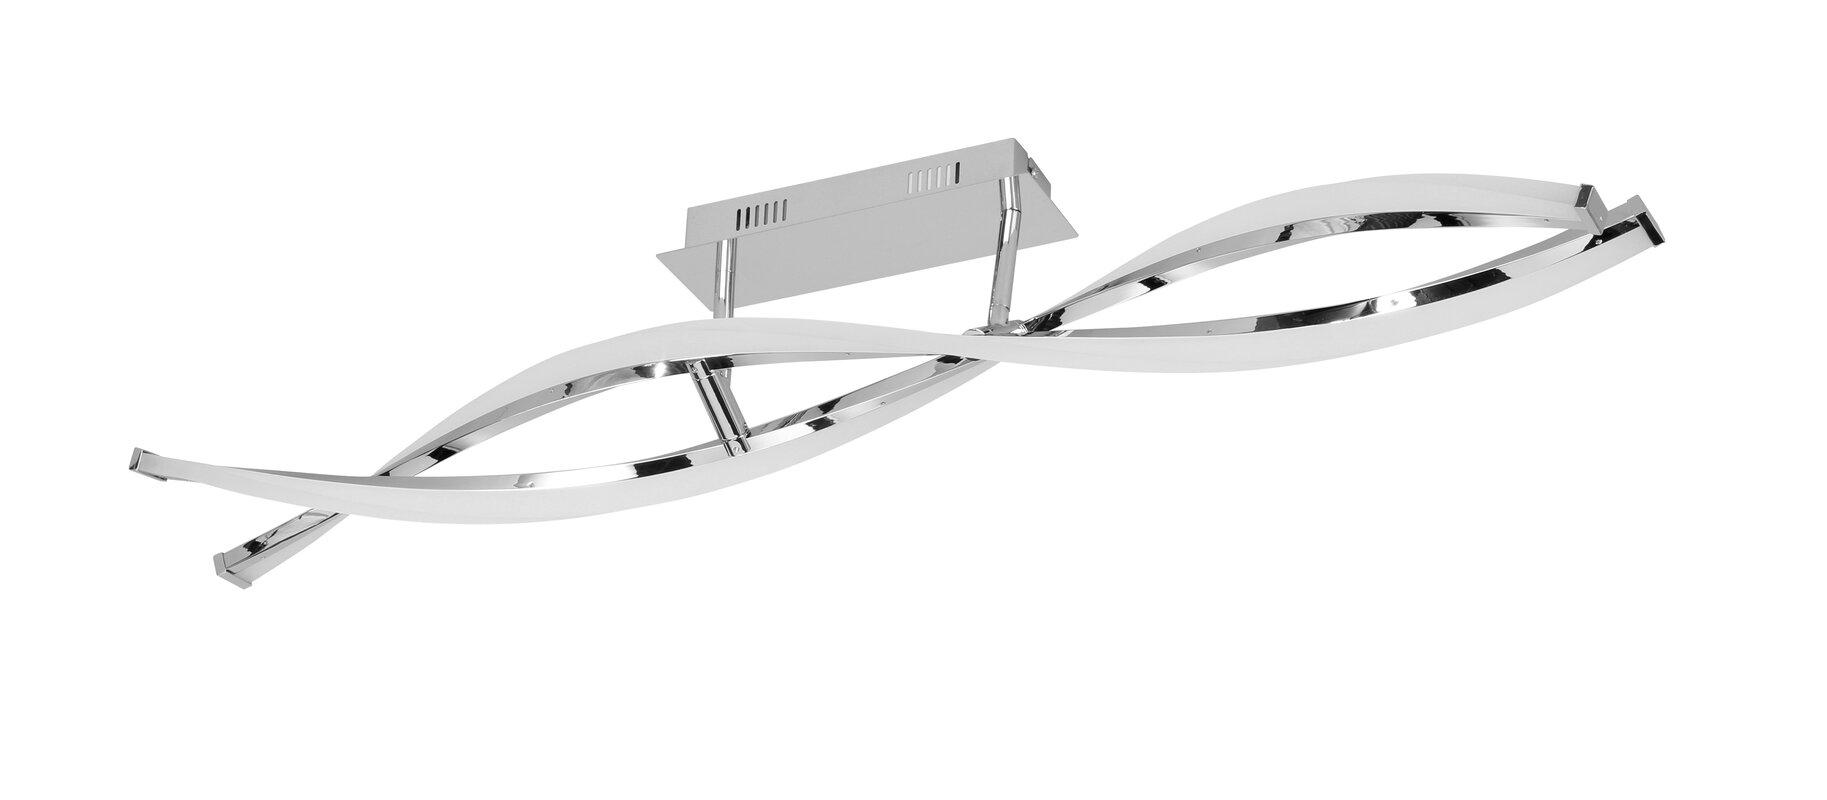 wofi deckenleuchte 2 flammig idana bewertungen. Black Bedroom Furniture Sets. Home Design Ideas